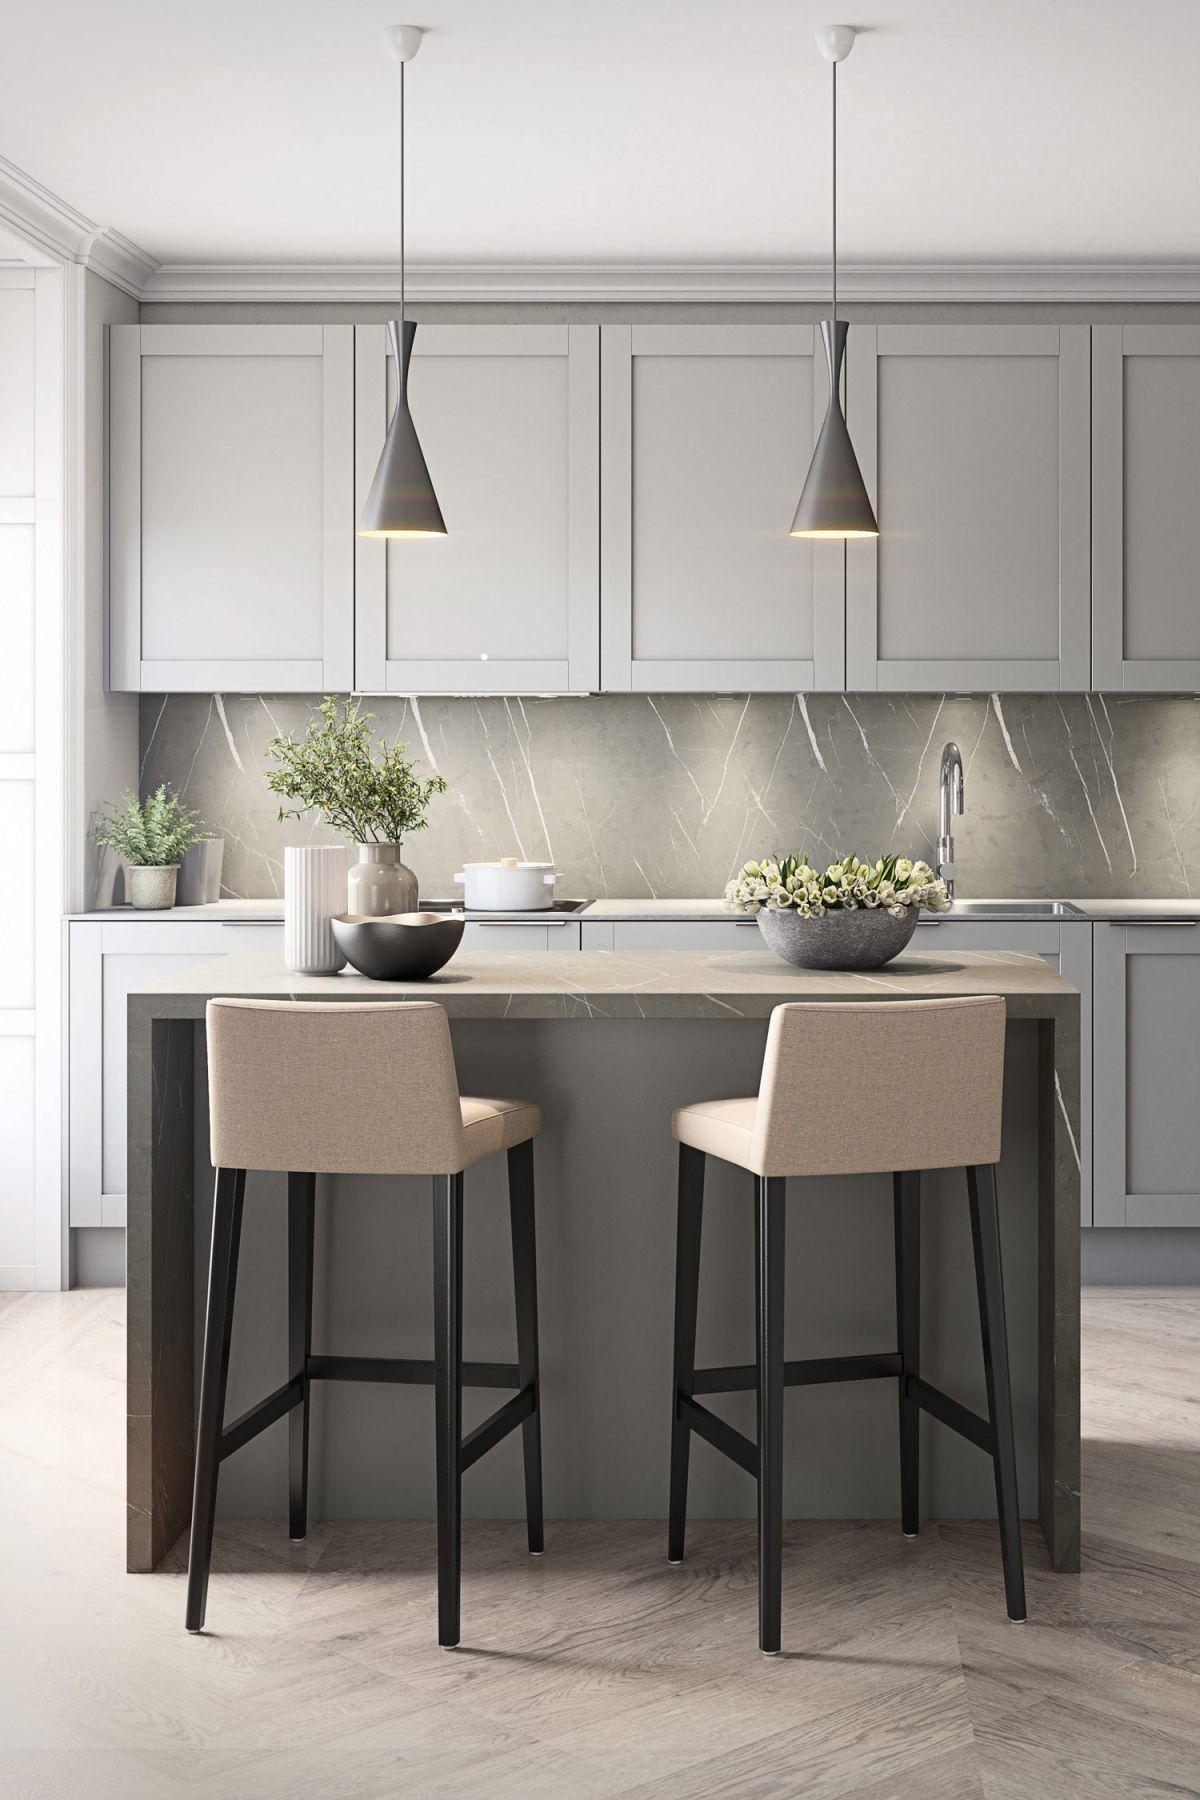 small kitchen island ideas: 12 kitchen island ideas for small kitchens   livingetc